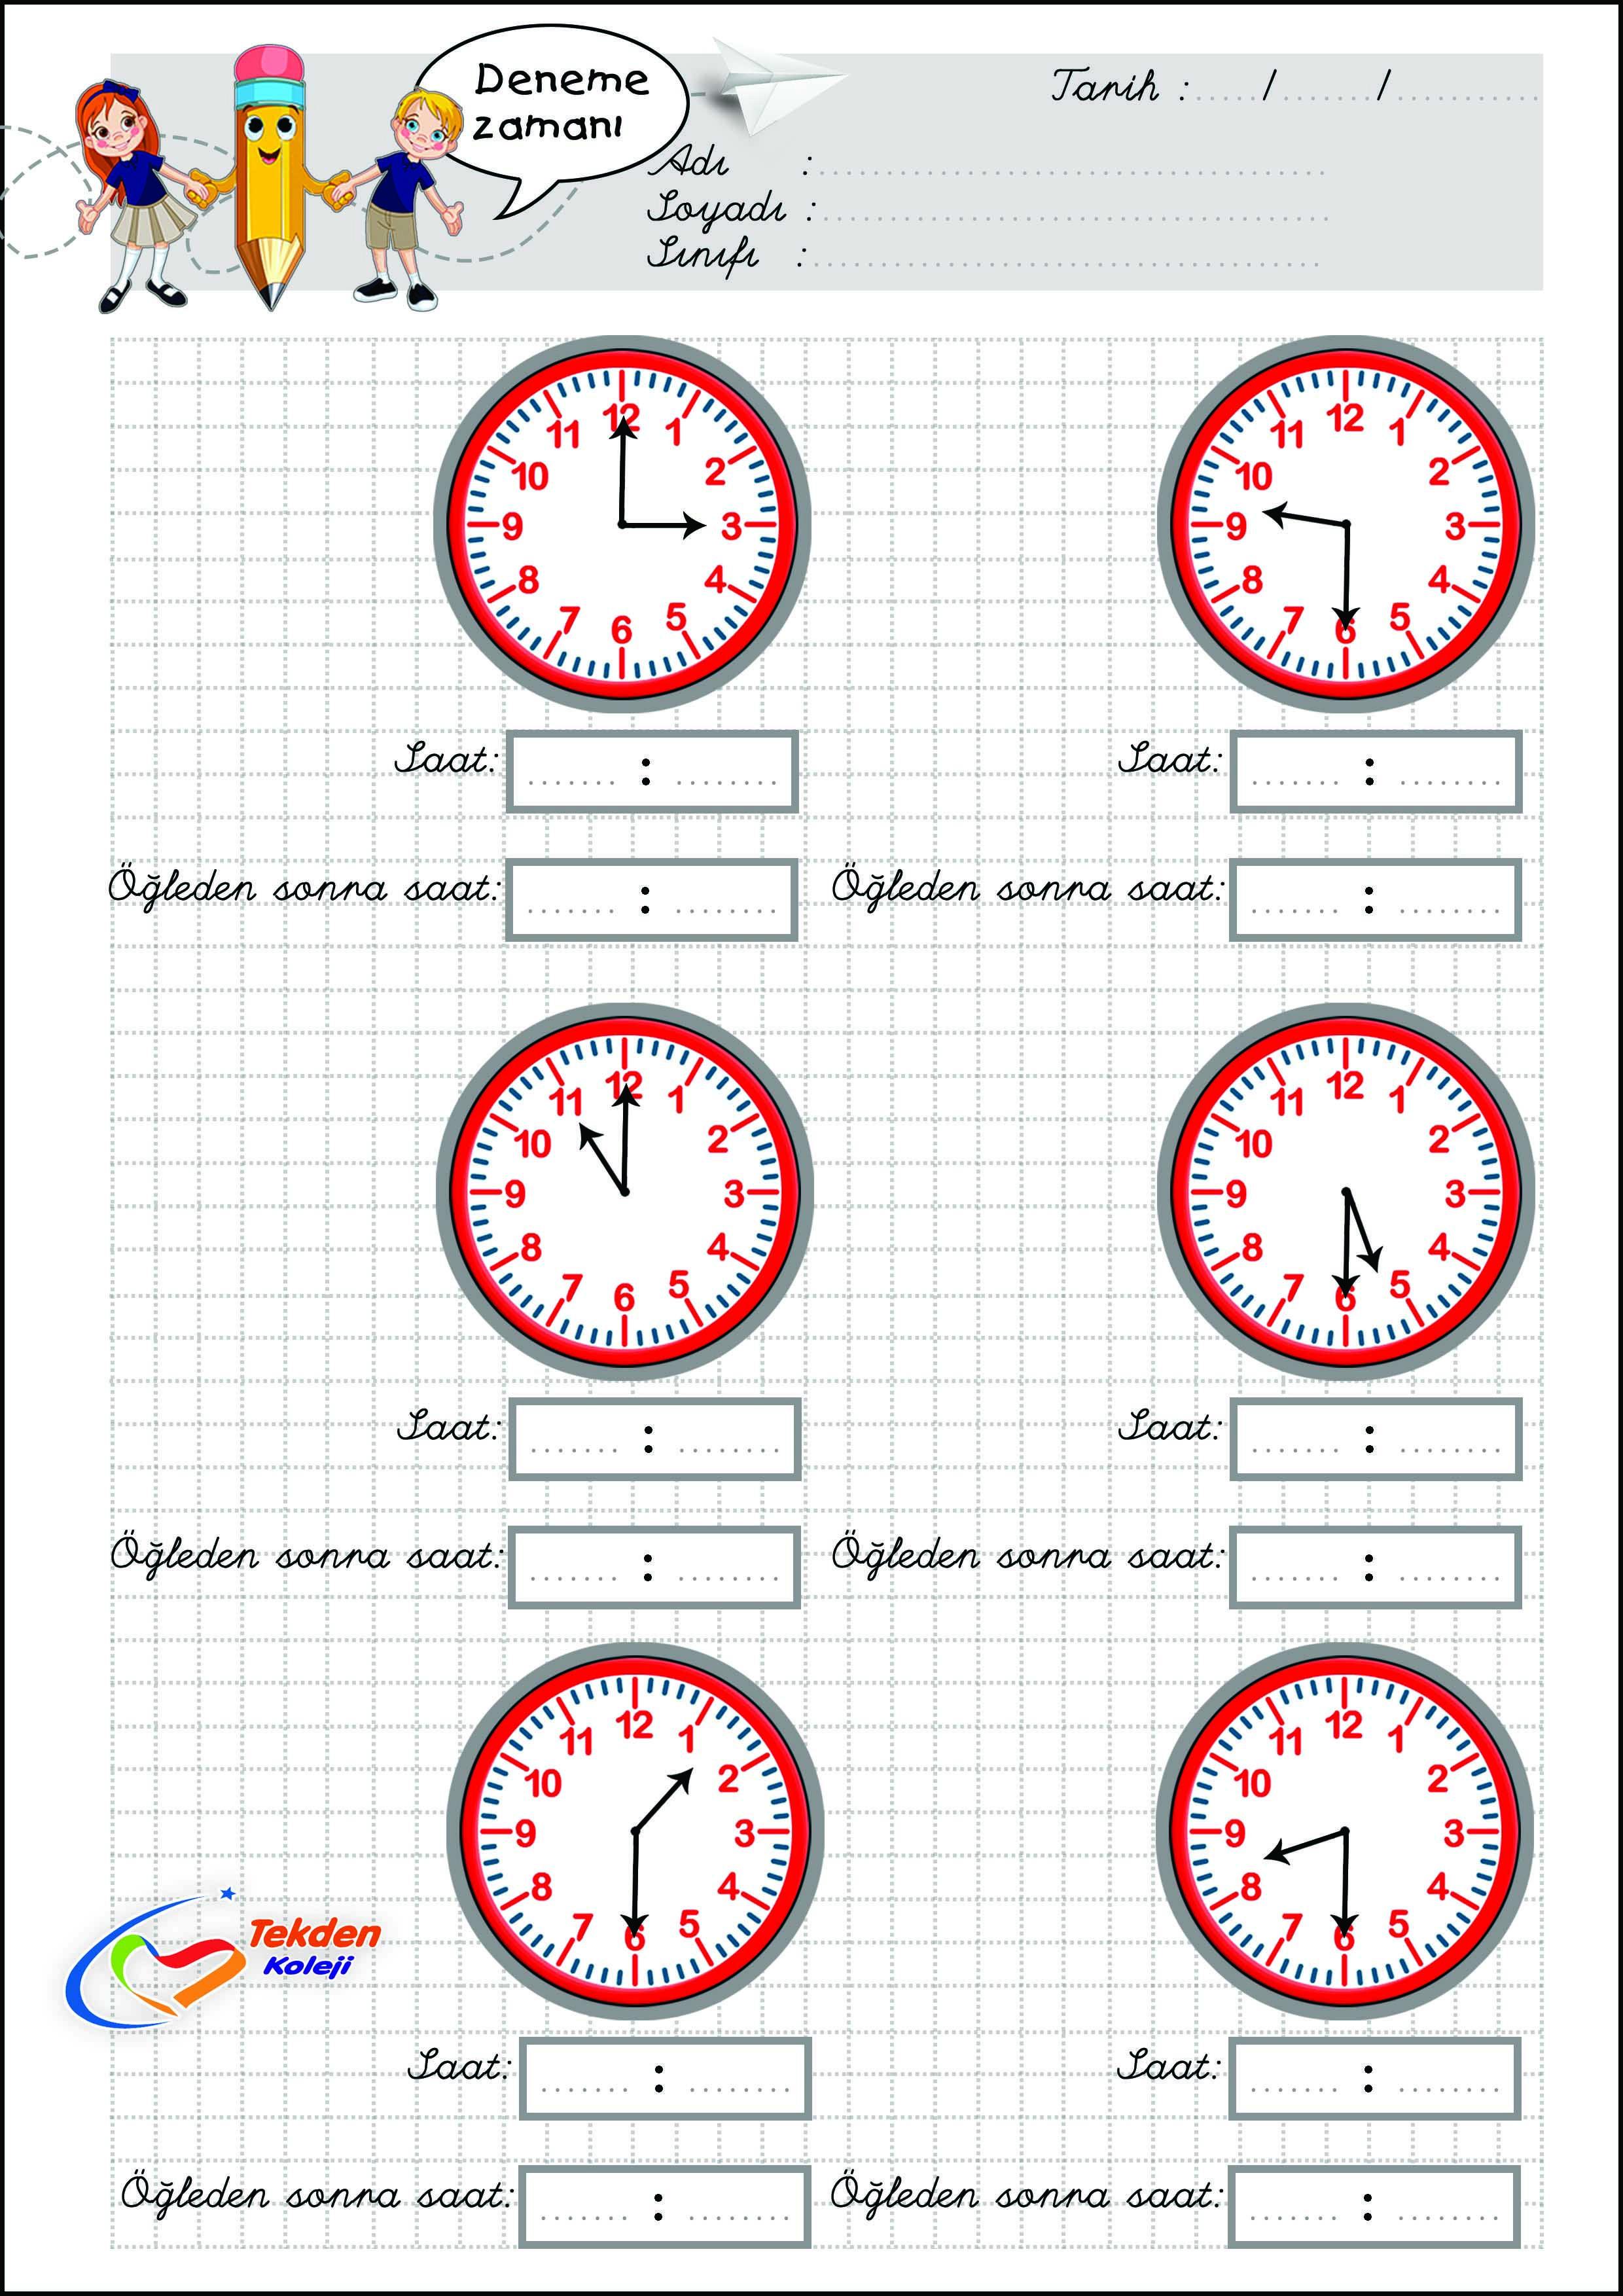 Saatler Calisma Kagidi 1 Sinif Matematik Matematik Sinif Duzeni